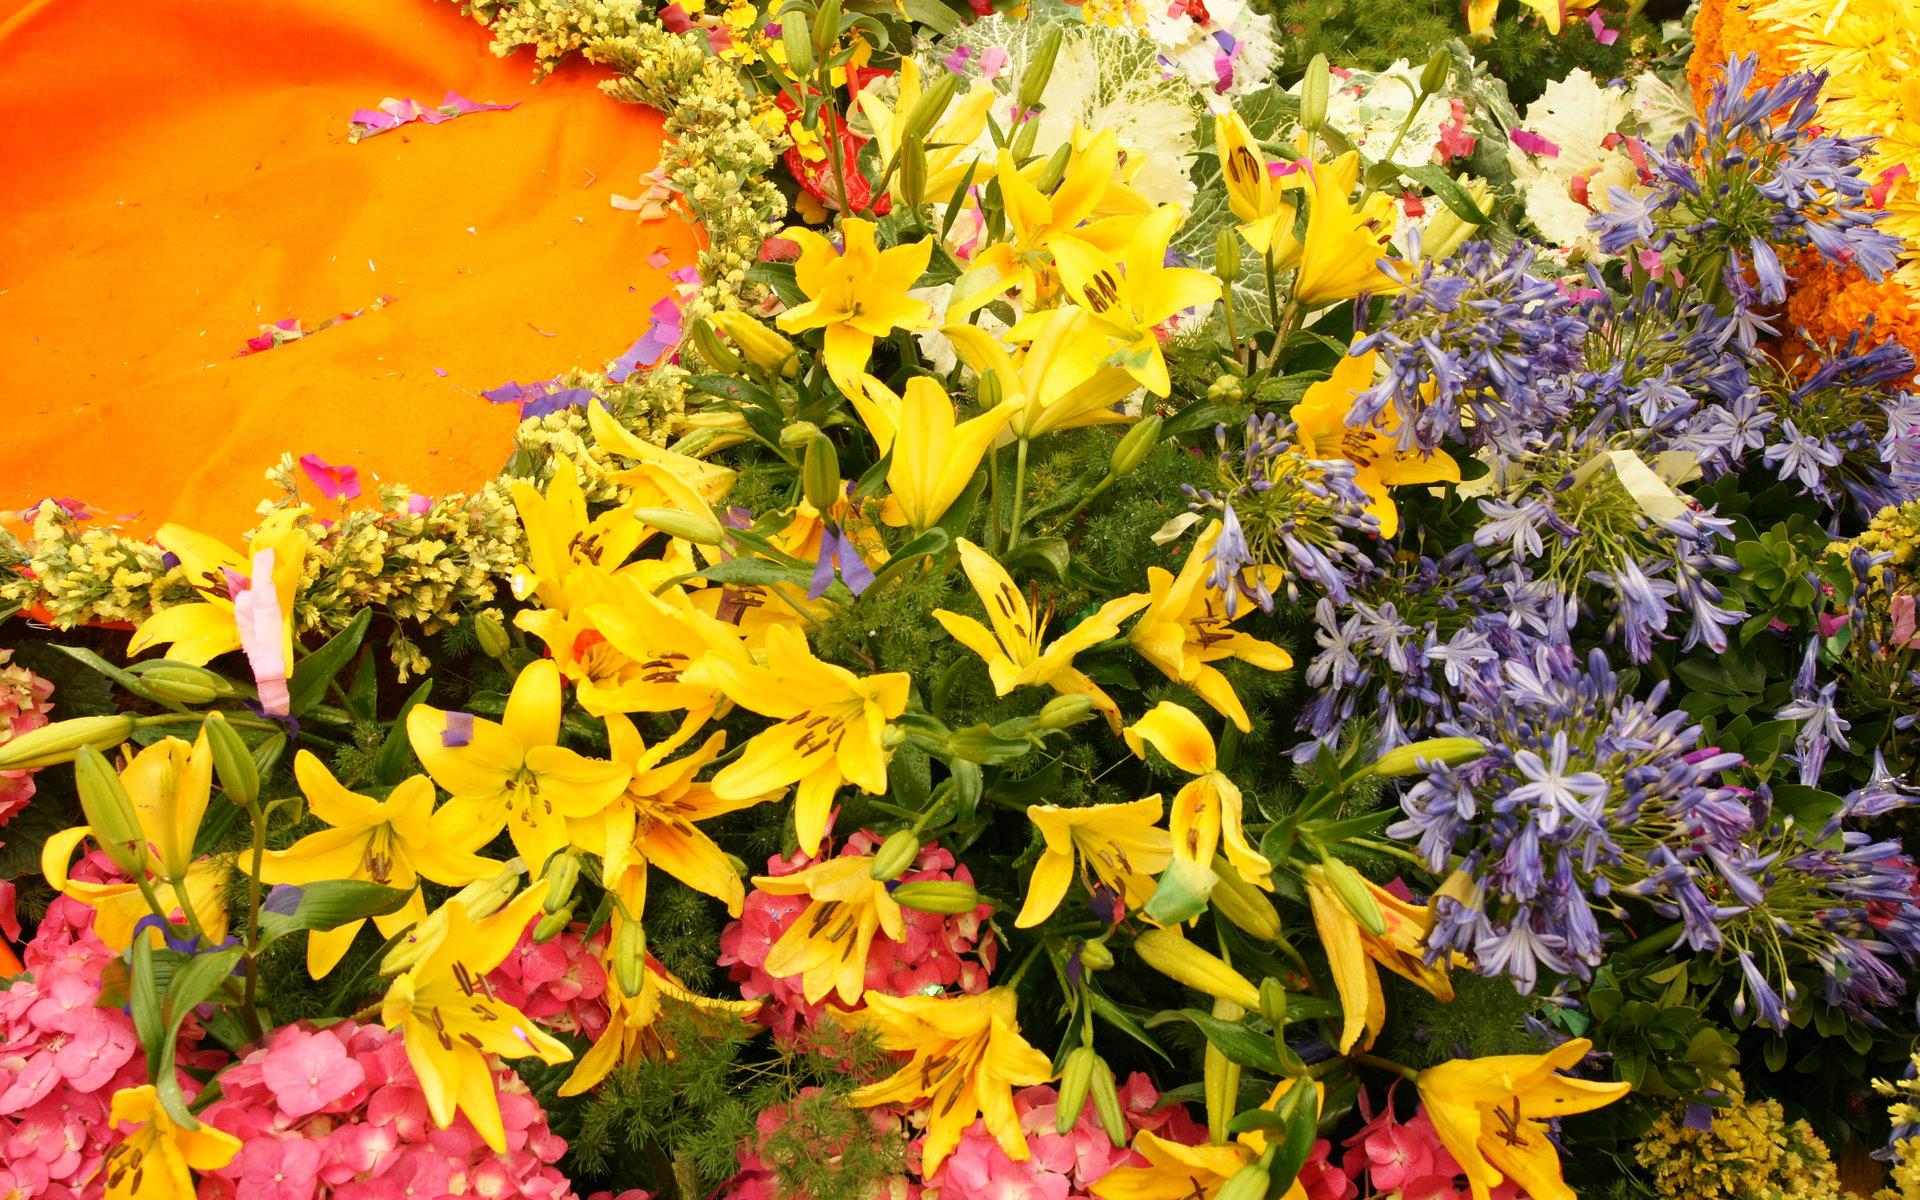 Flowers In Bloom Widescreen Wallpapers